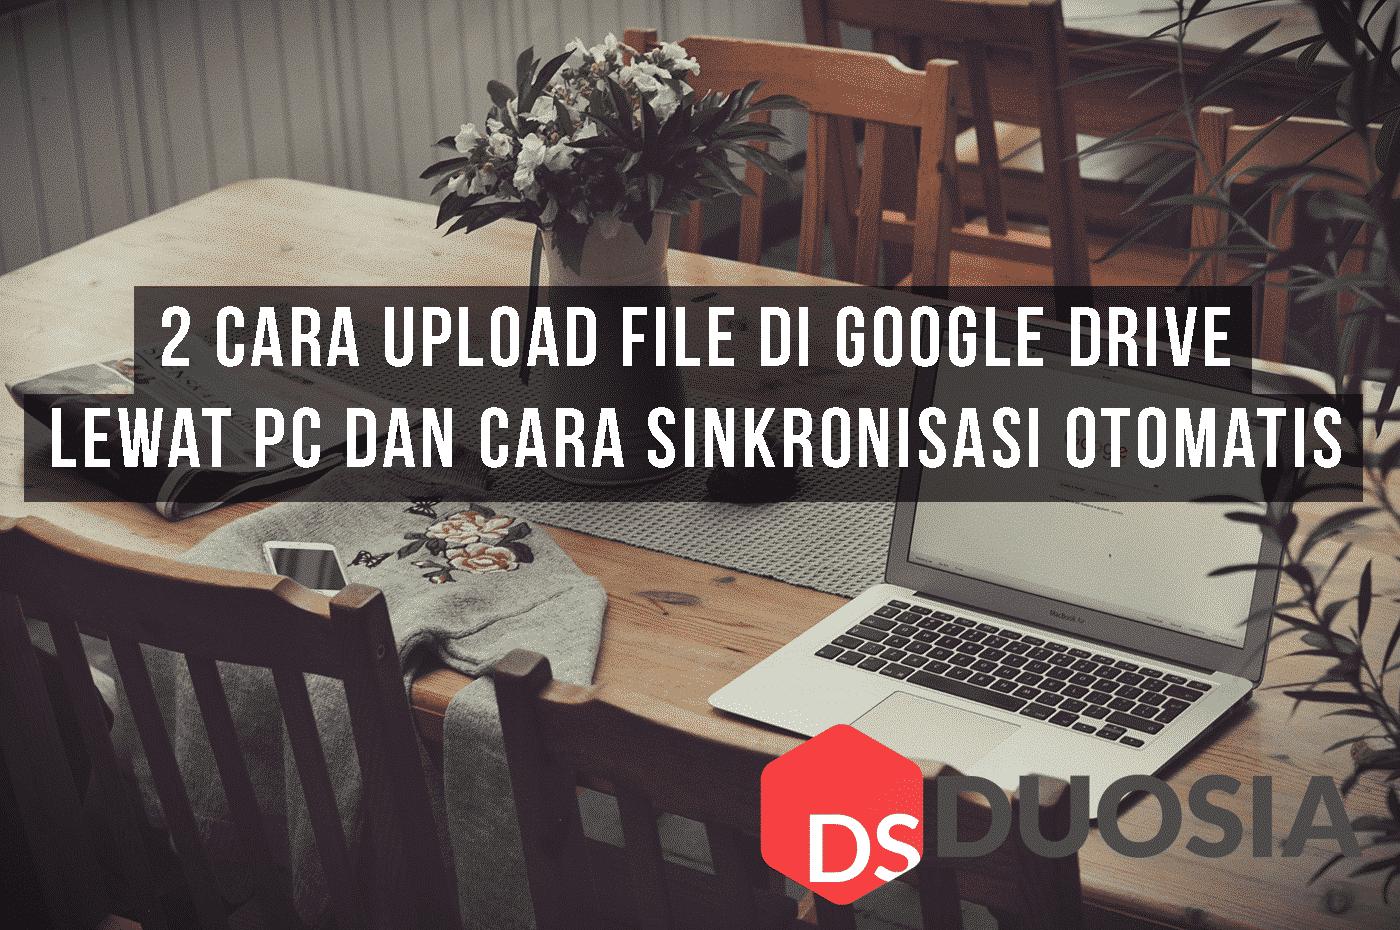 Cara Mengatasi Quota Exceed Google Drive